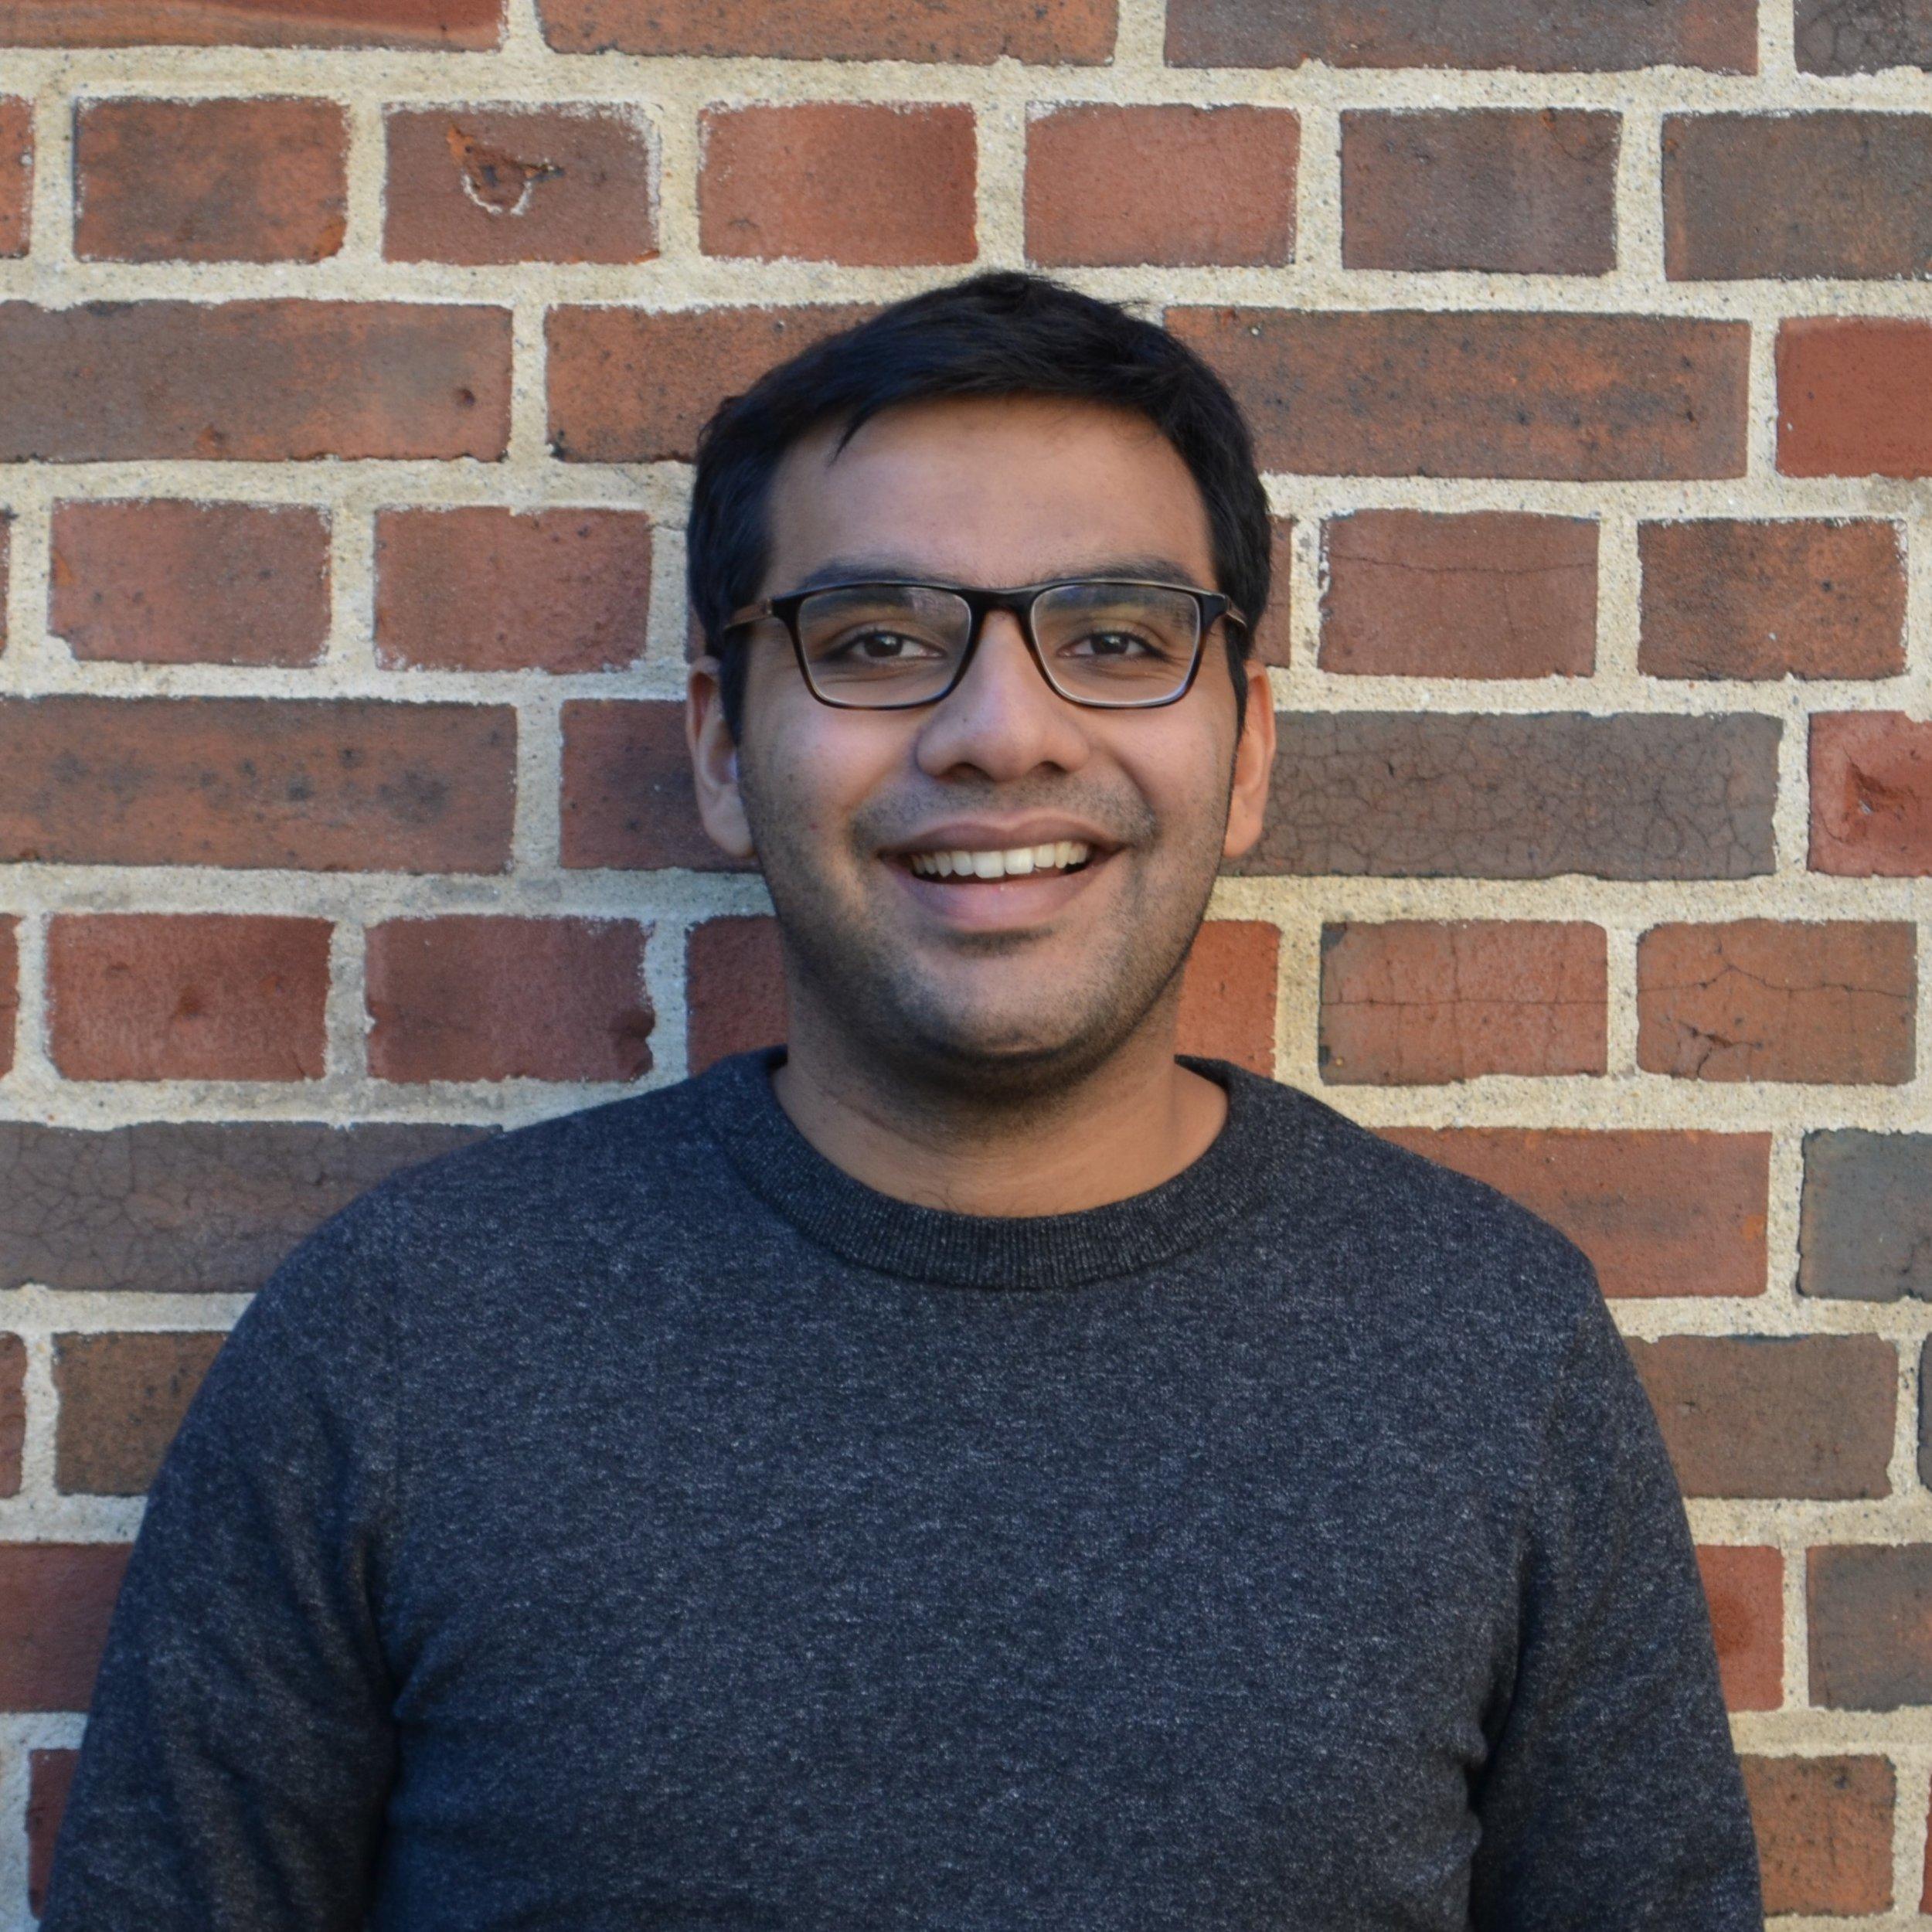 Vishan Nigam - BA Economics (Princeton)Faculty Supervisor: Michael Greenstone